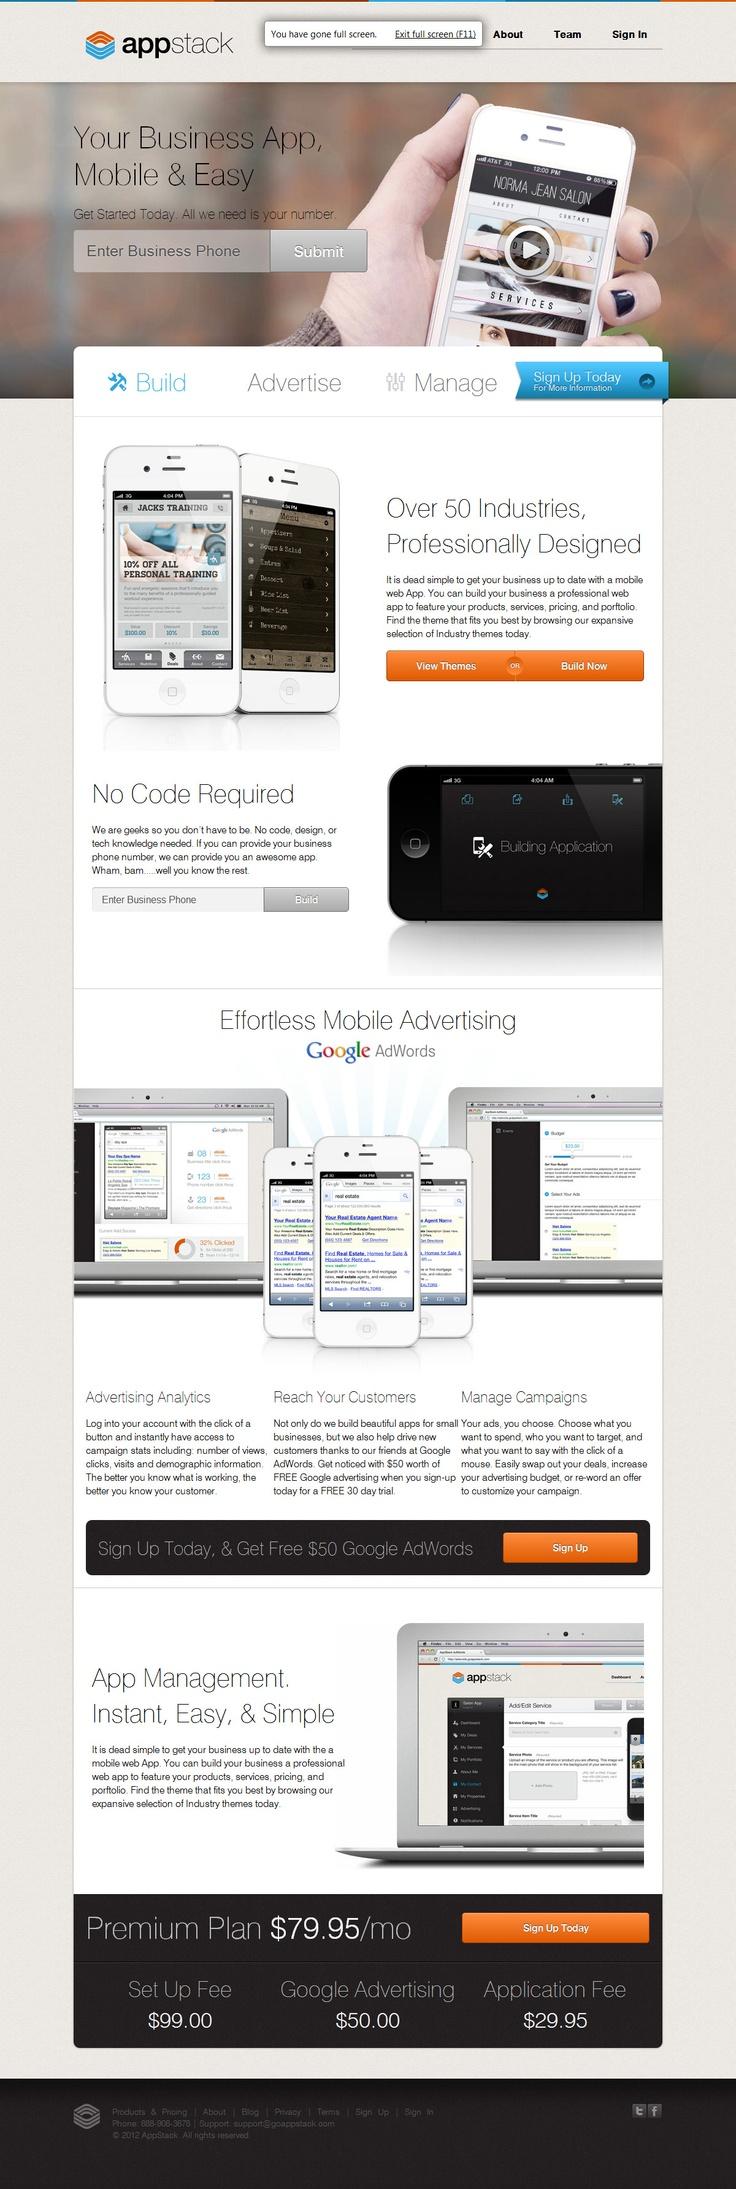 App Stack, 22nd May 2012